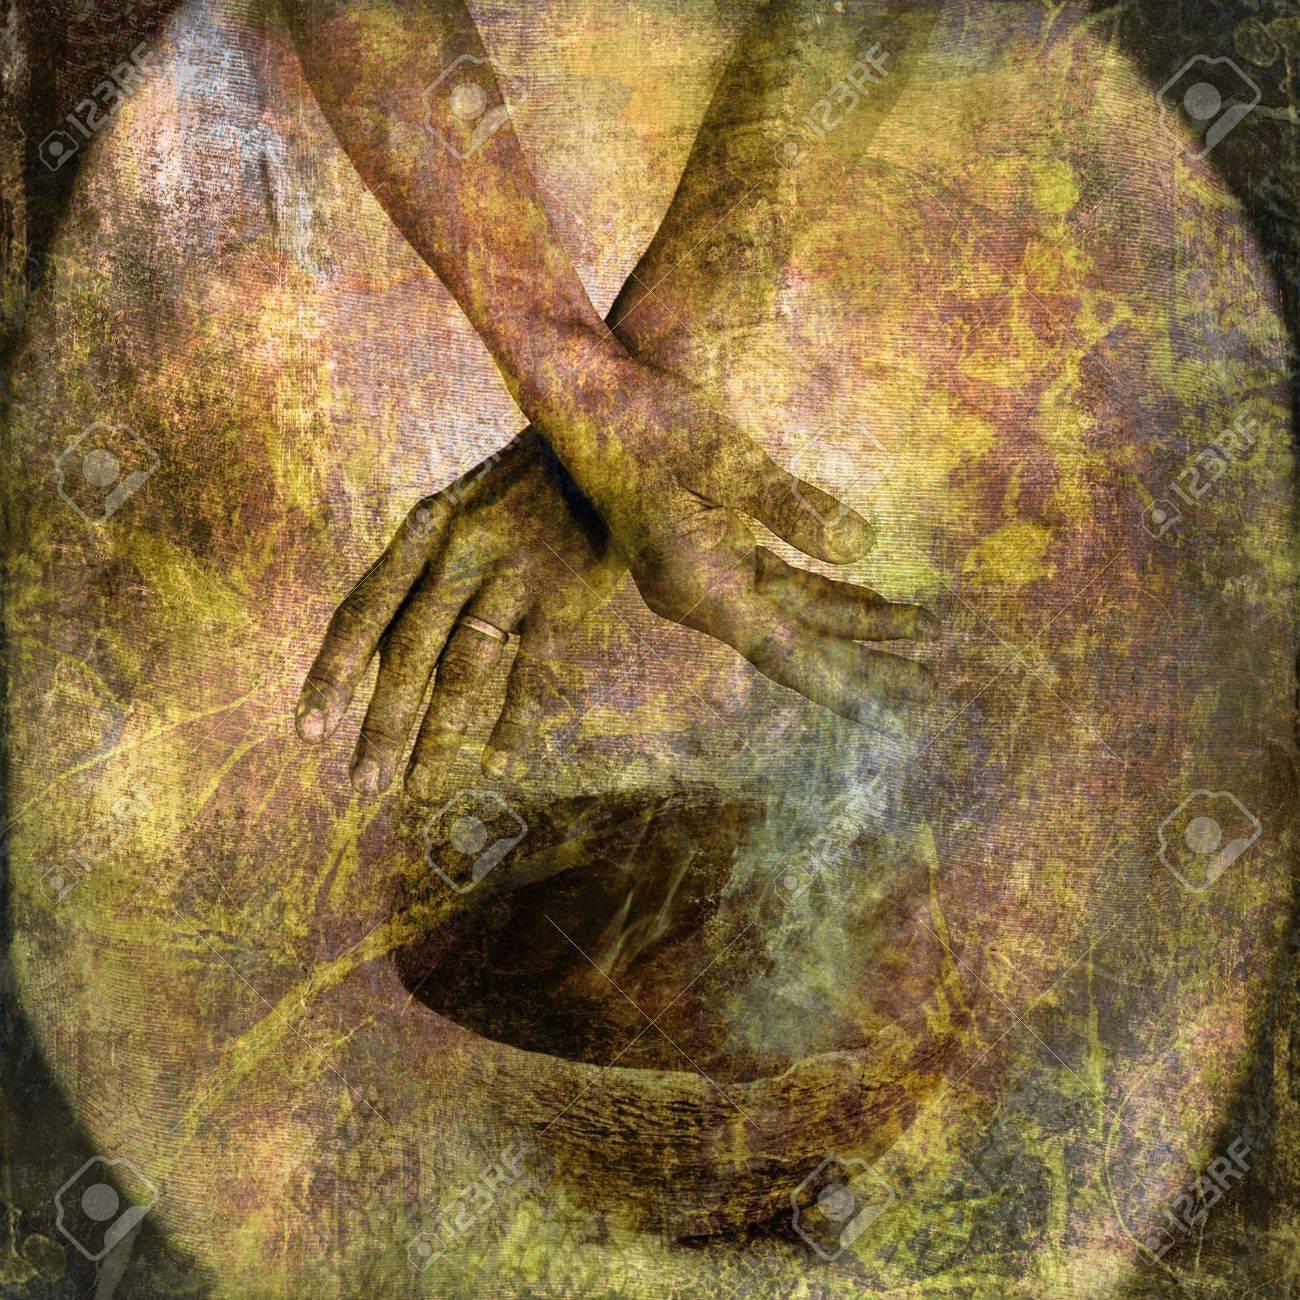 Hand with bowl and smoke. Photo based illustration. Stock Illustration - 5169099